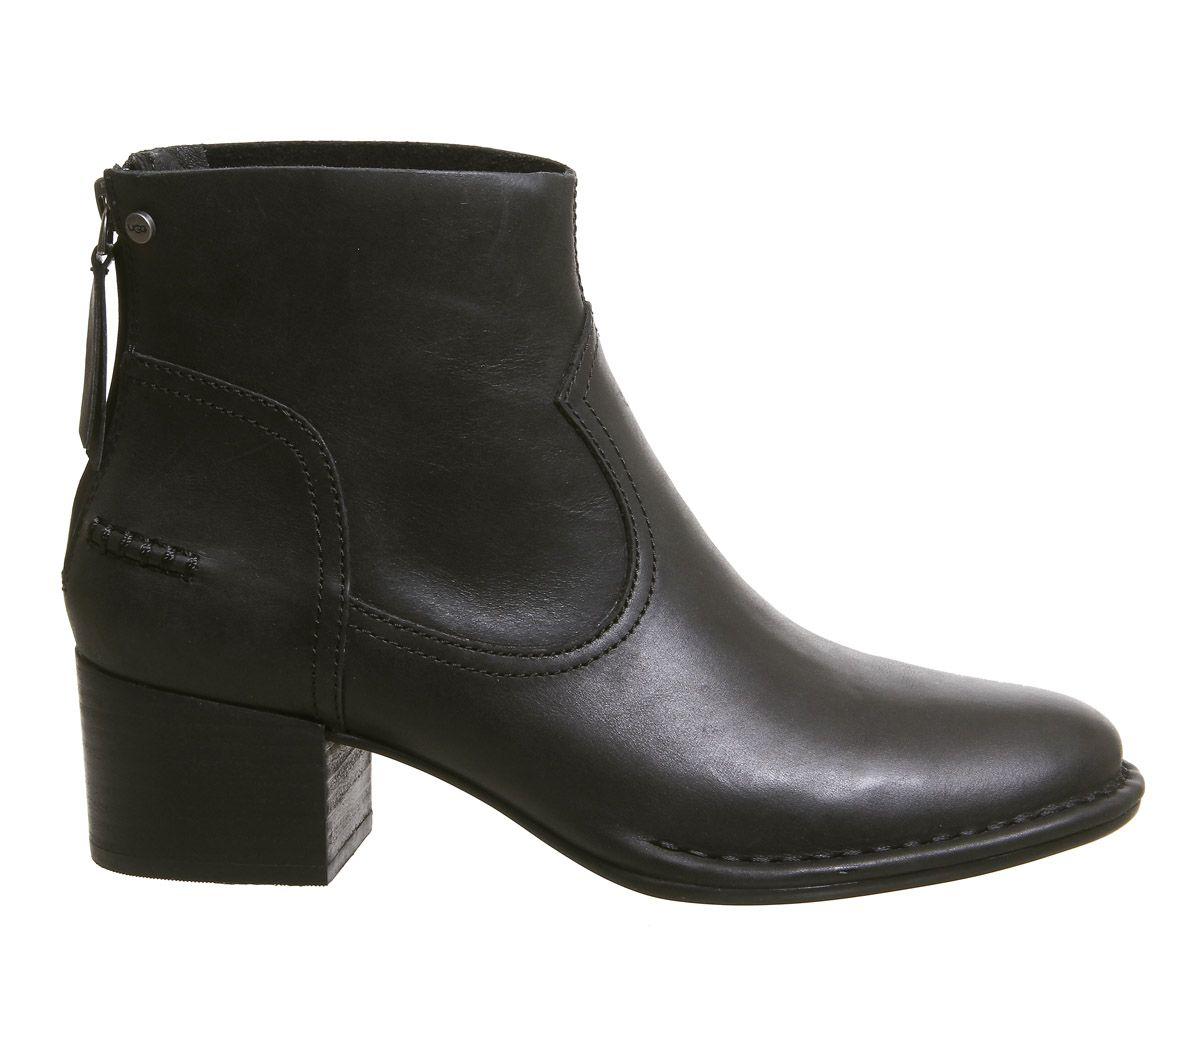 d690d37b3f0 Bandara Ankle Boots